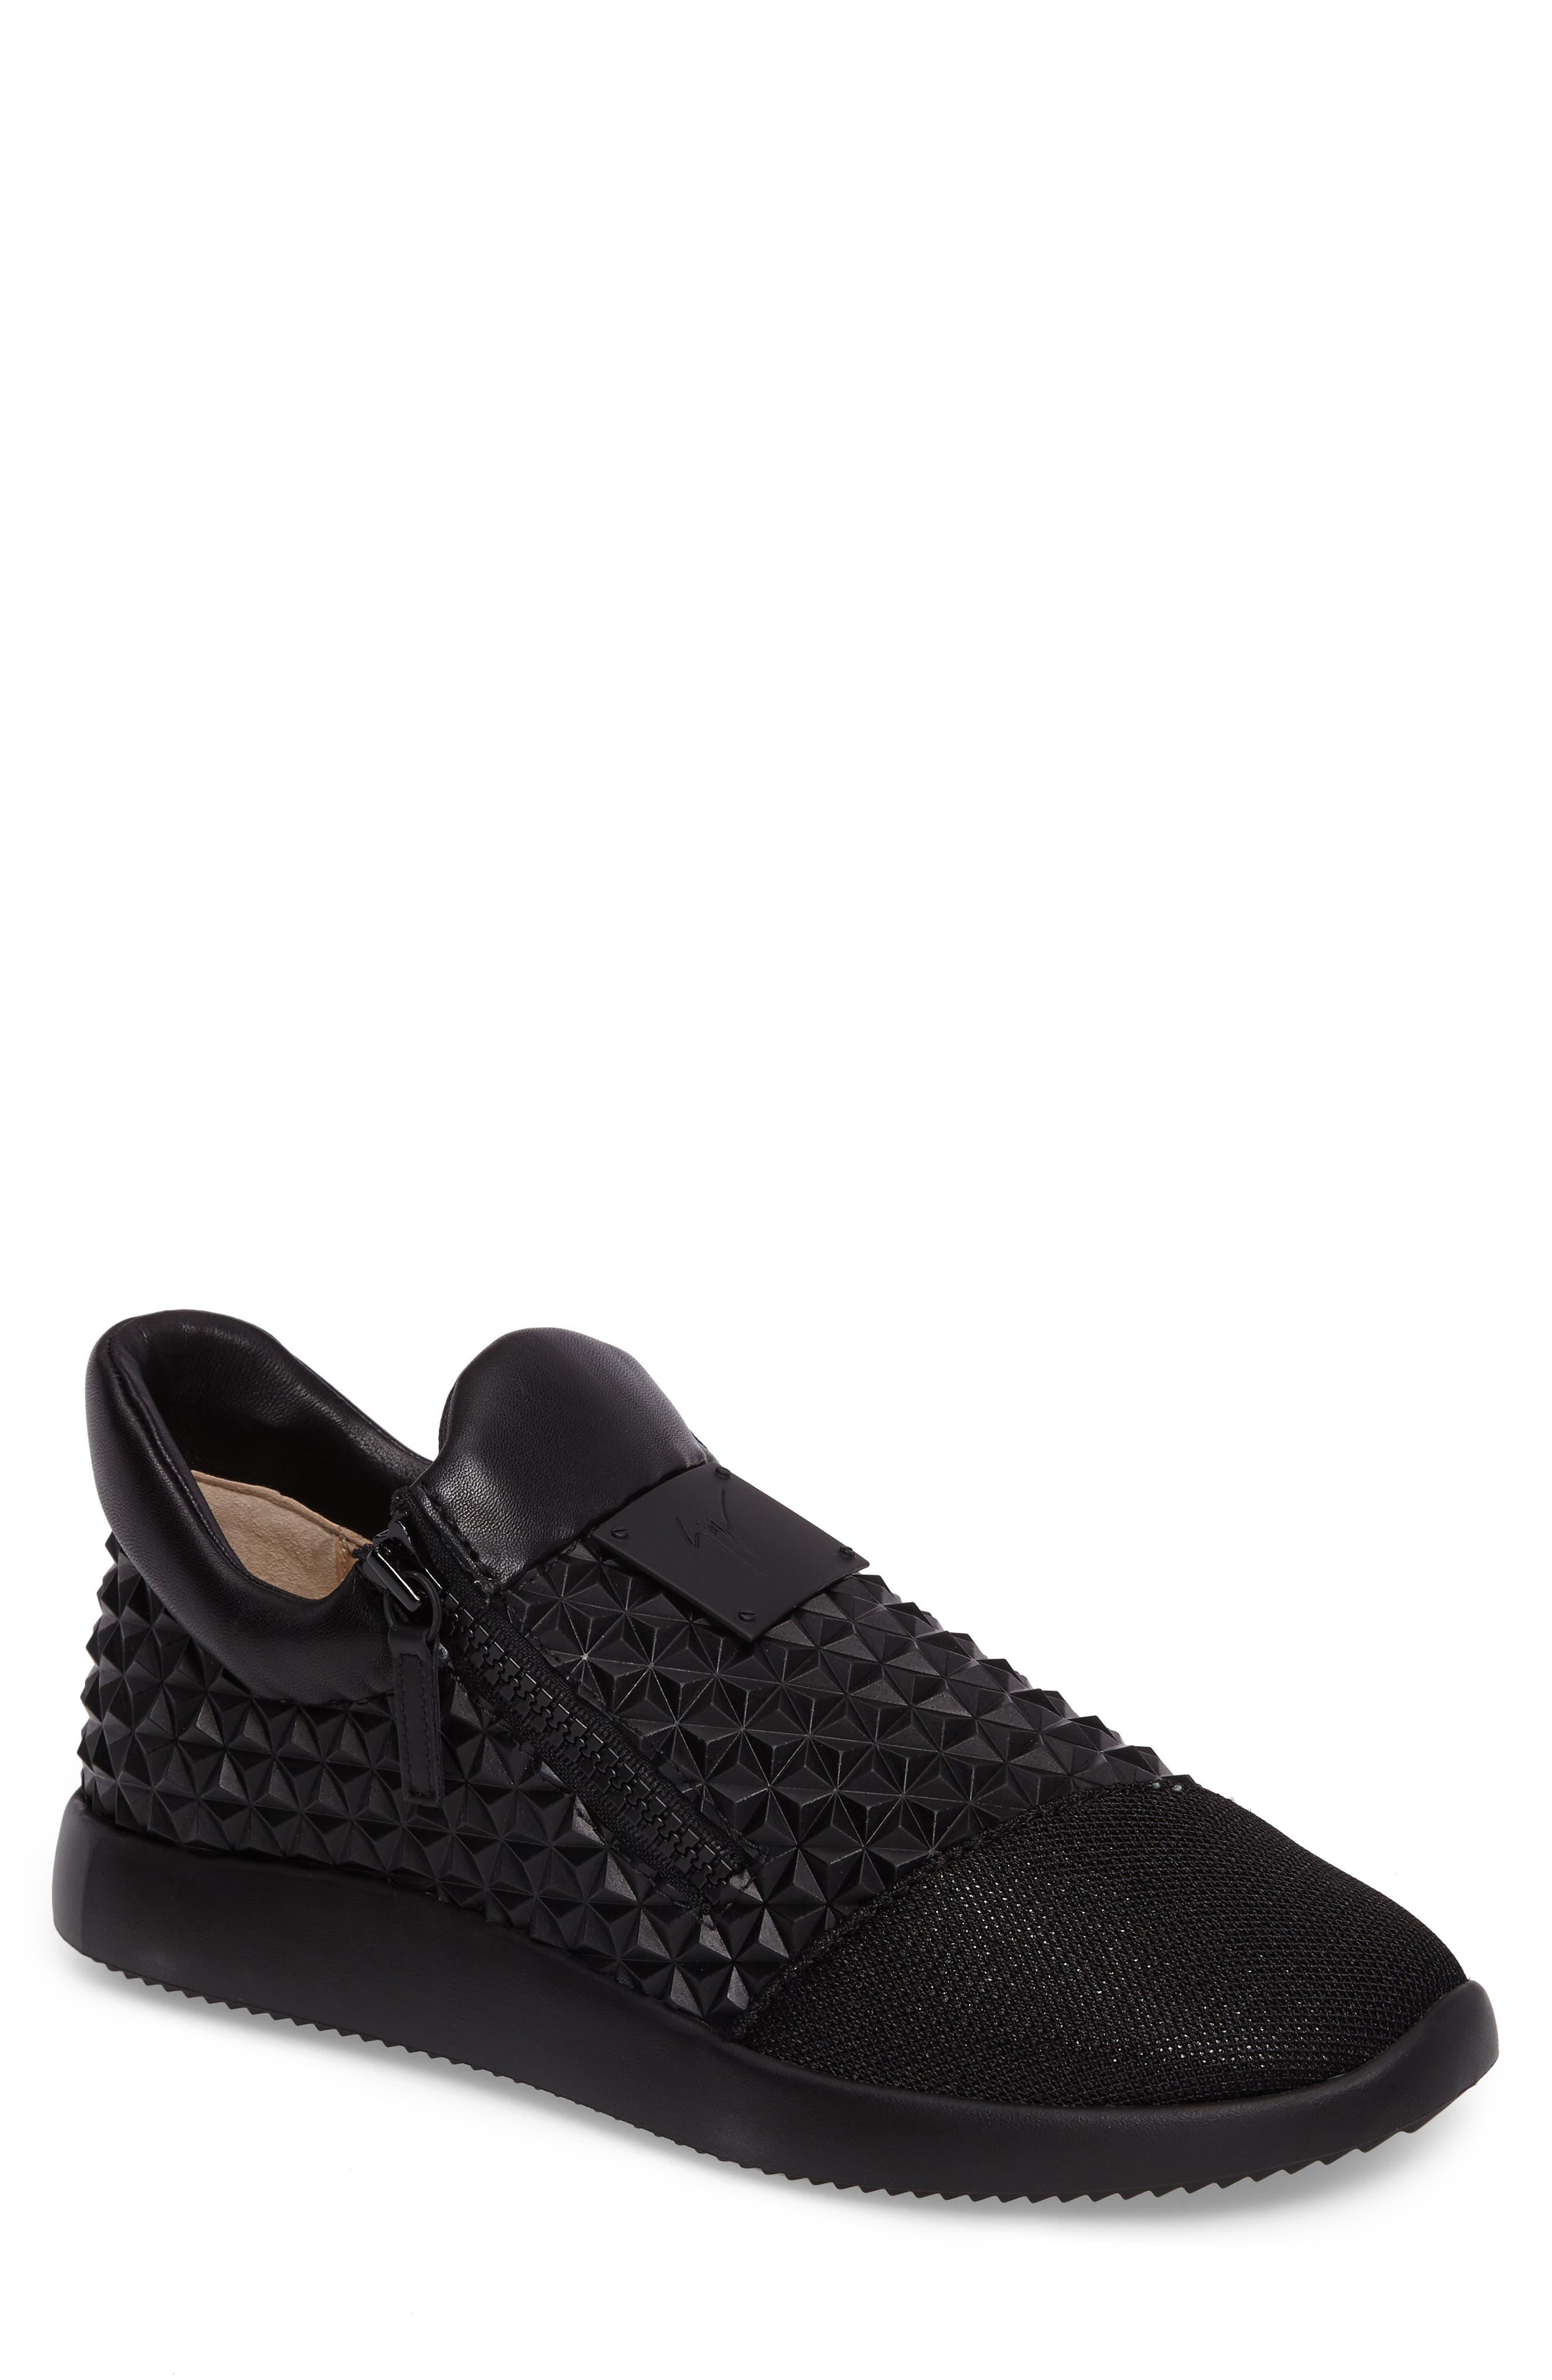 Alternate Image 1 Selected - Giuseppe Zanotti Geo Embossed Zip Sneaker (Men)